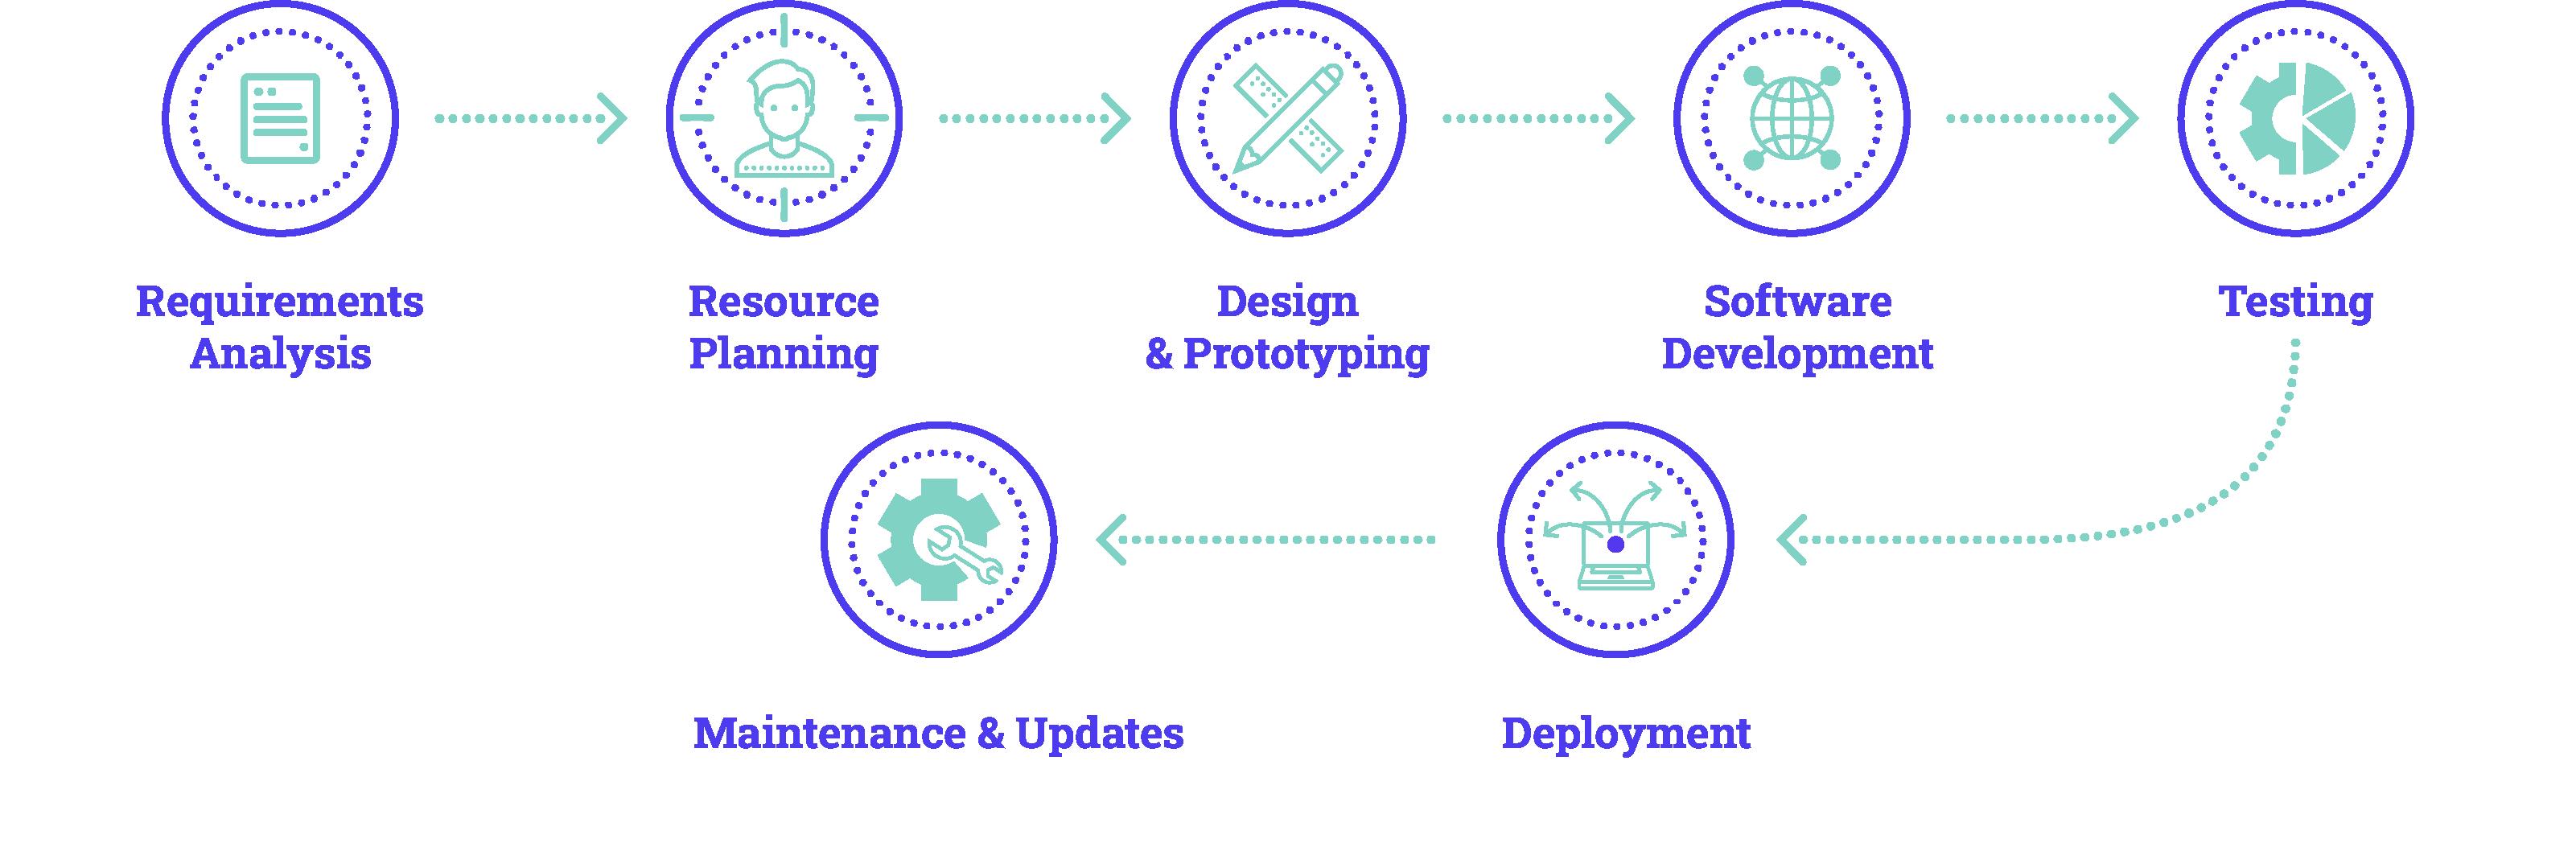 software-dev-process